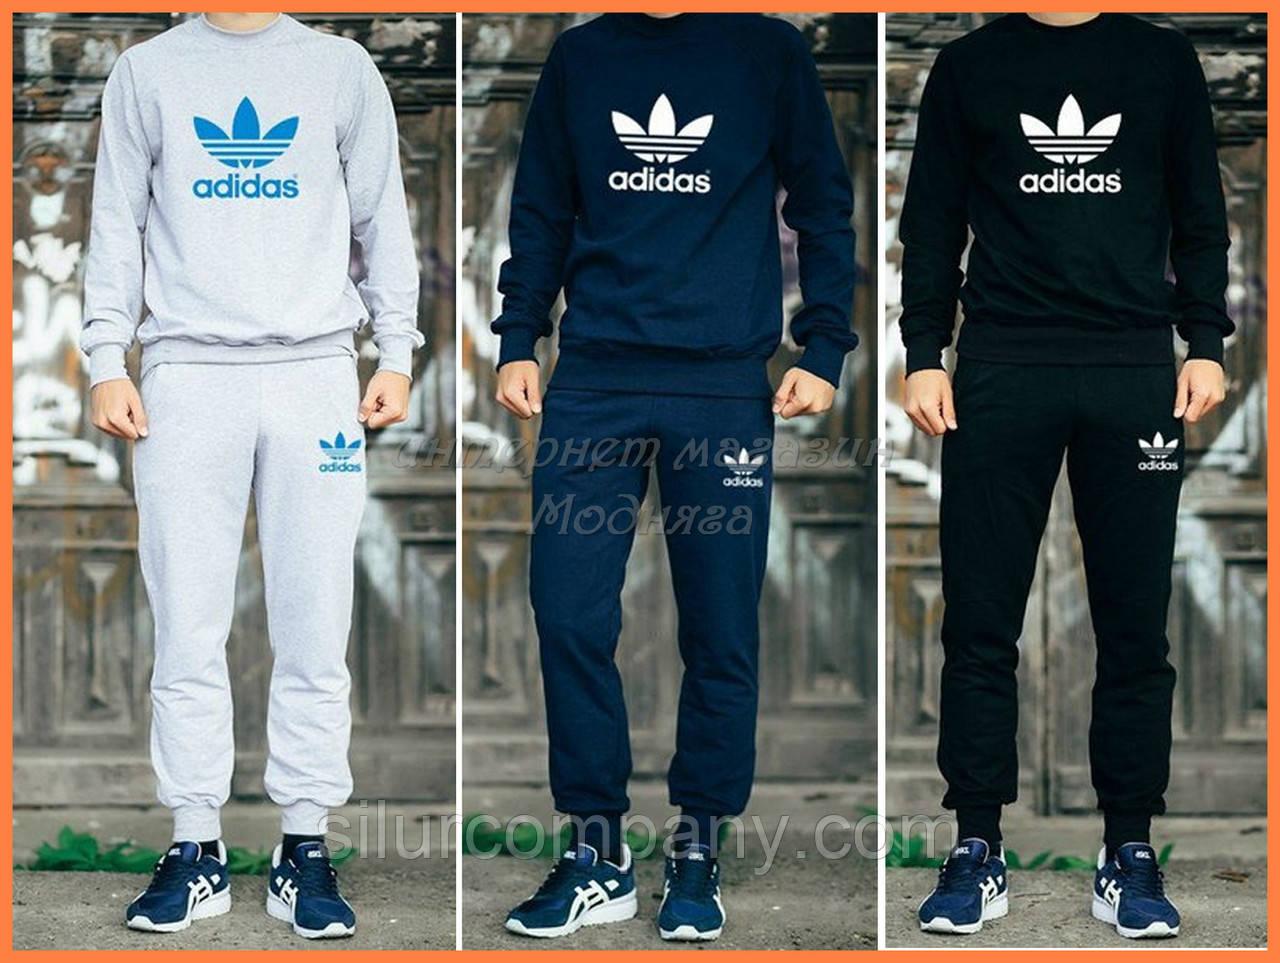 b5f59ac7 Мужской спортивный костюм Adidas свитшот и брюки - Интернет магазин